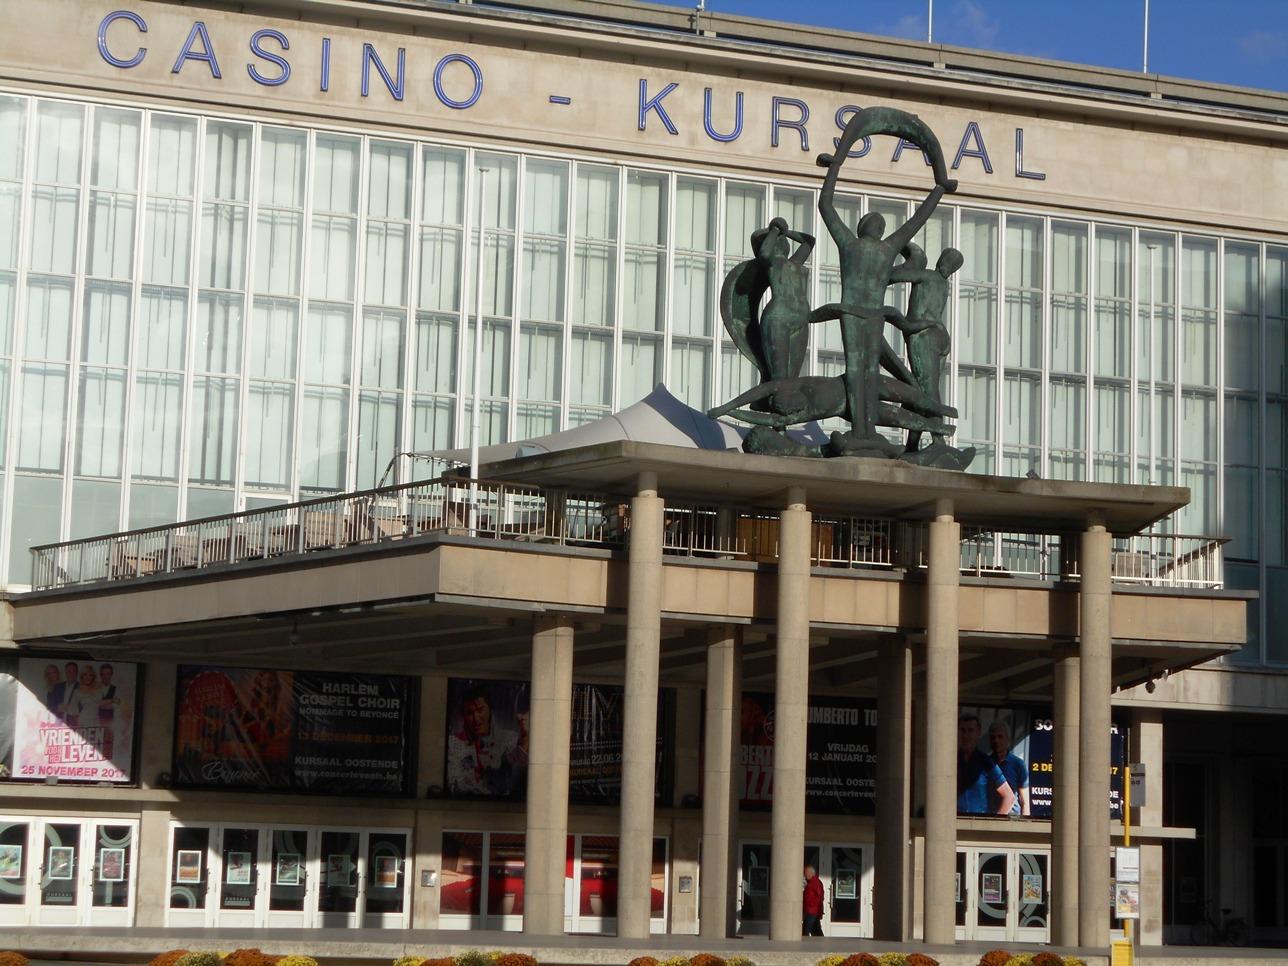 Casino - Kursaal Oostende